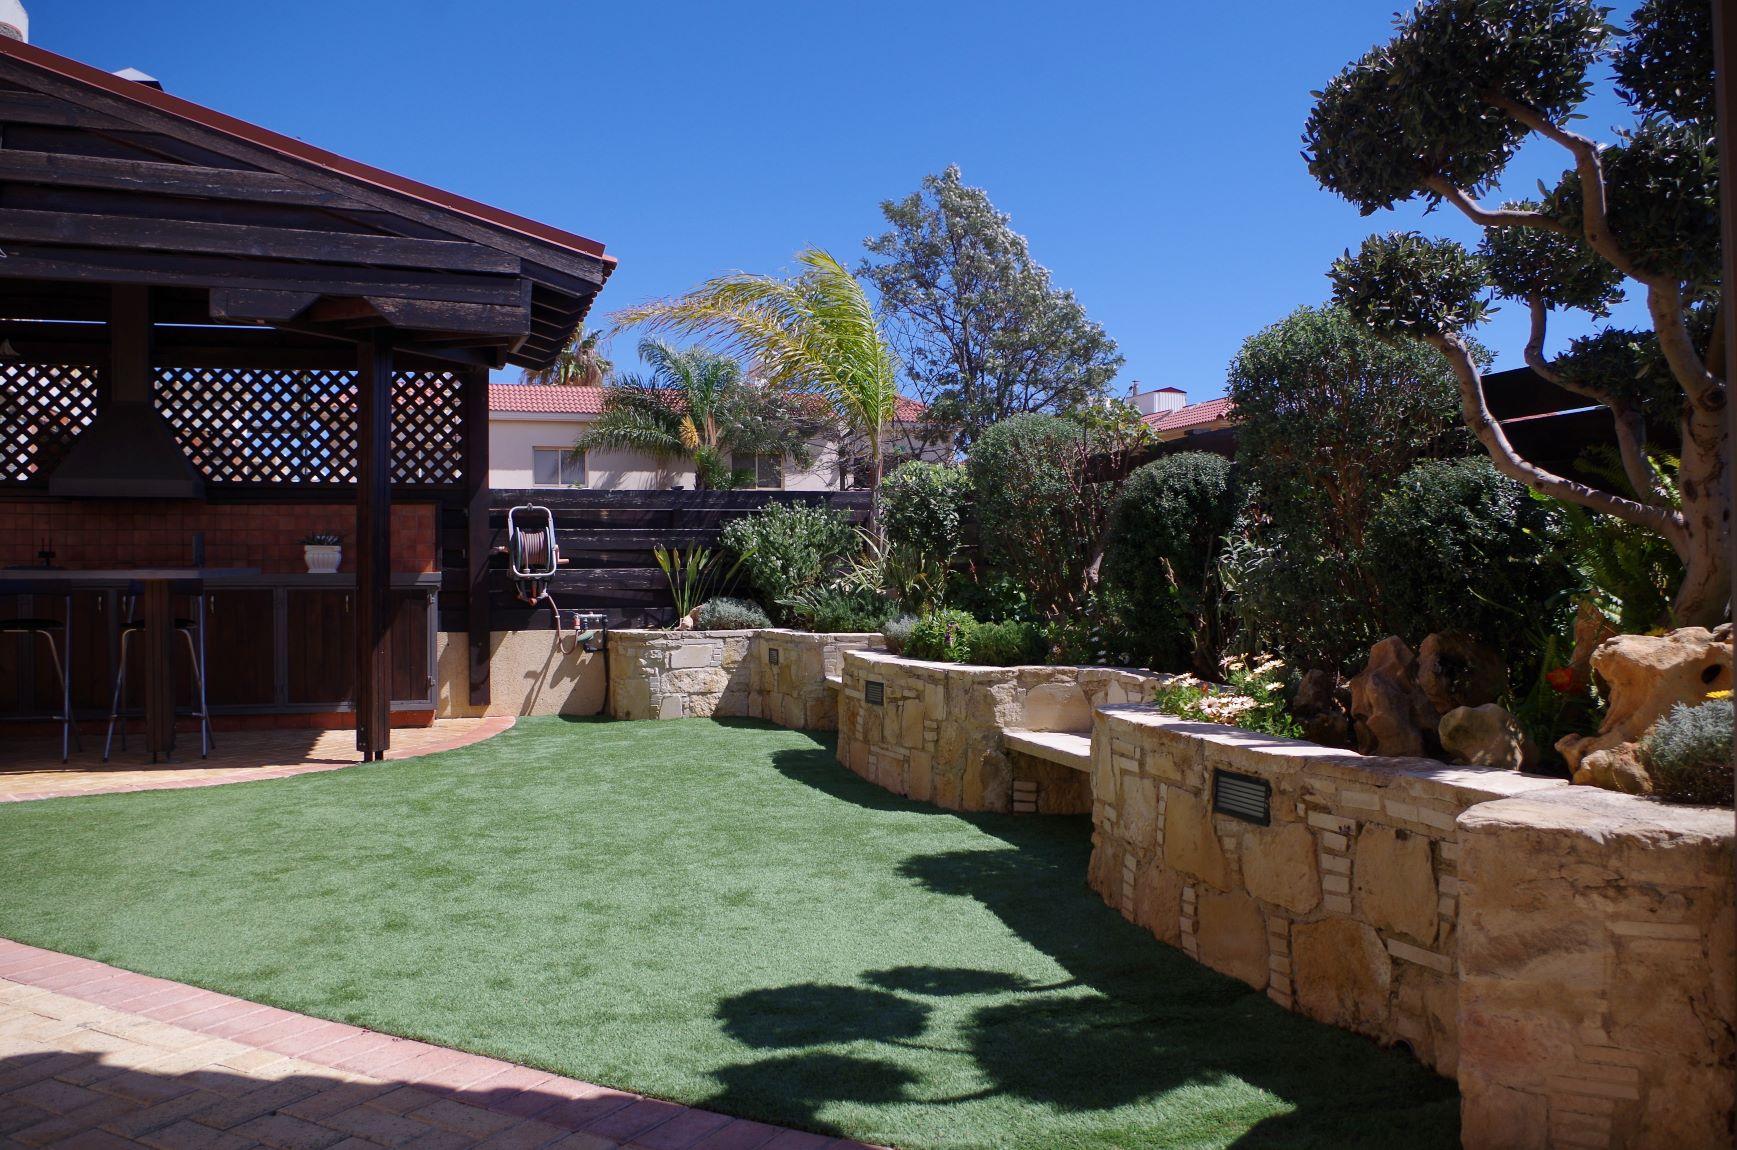 4bedroom House – Kato Polemidia Area